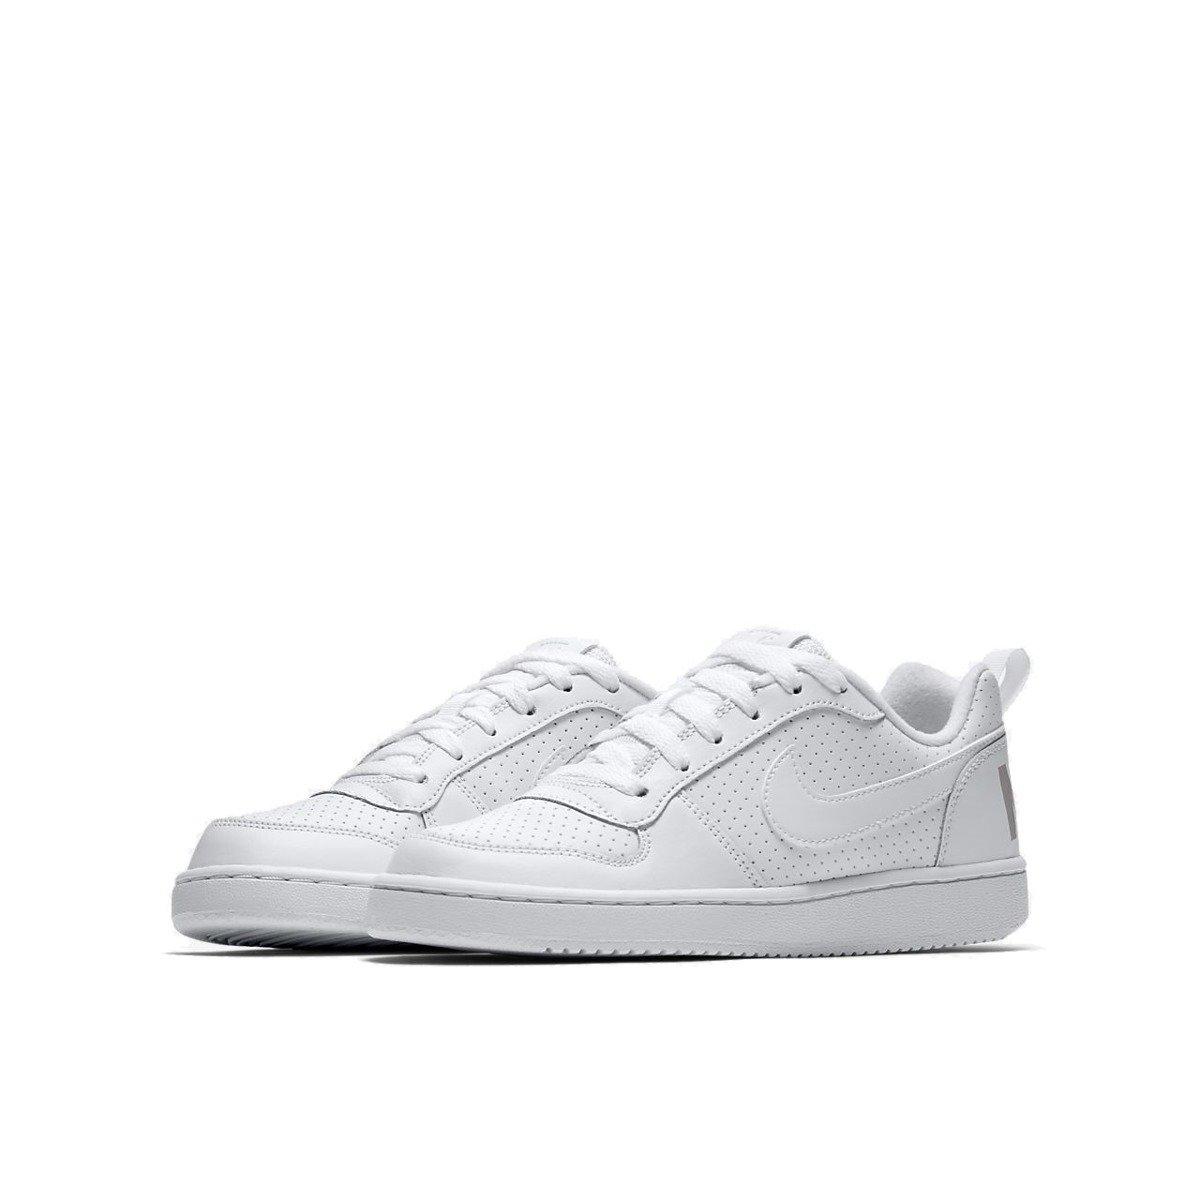 Nike Court Borough Low GS Shoes 839985 100 Adidas adiB